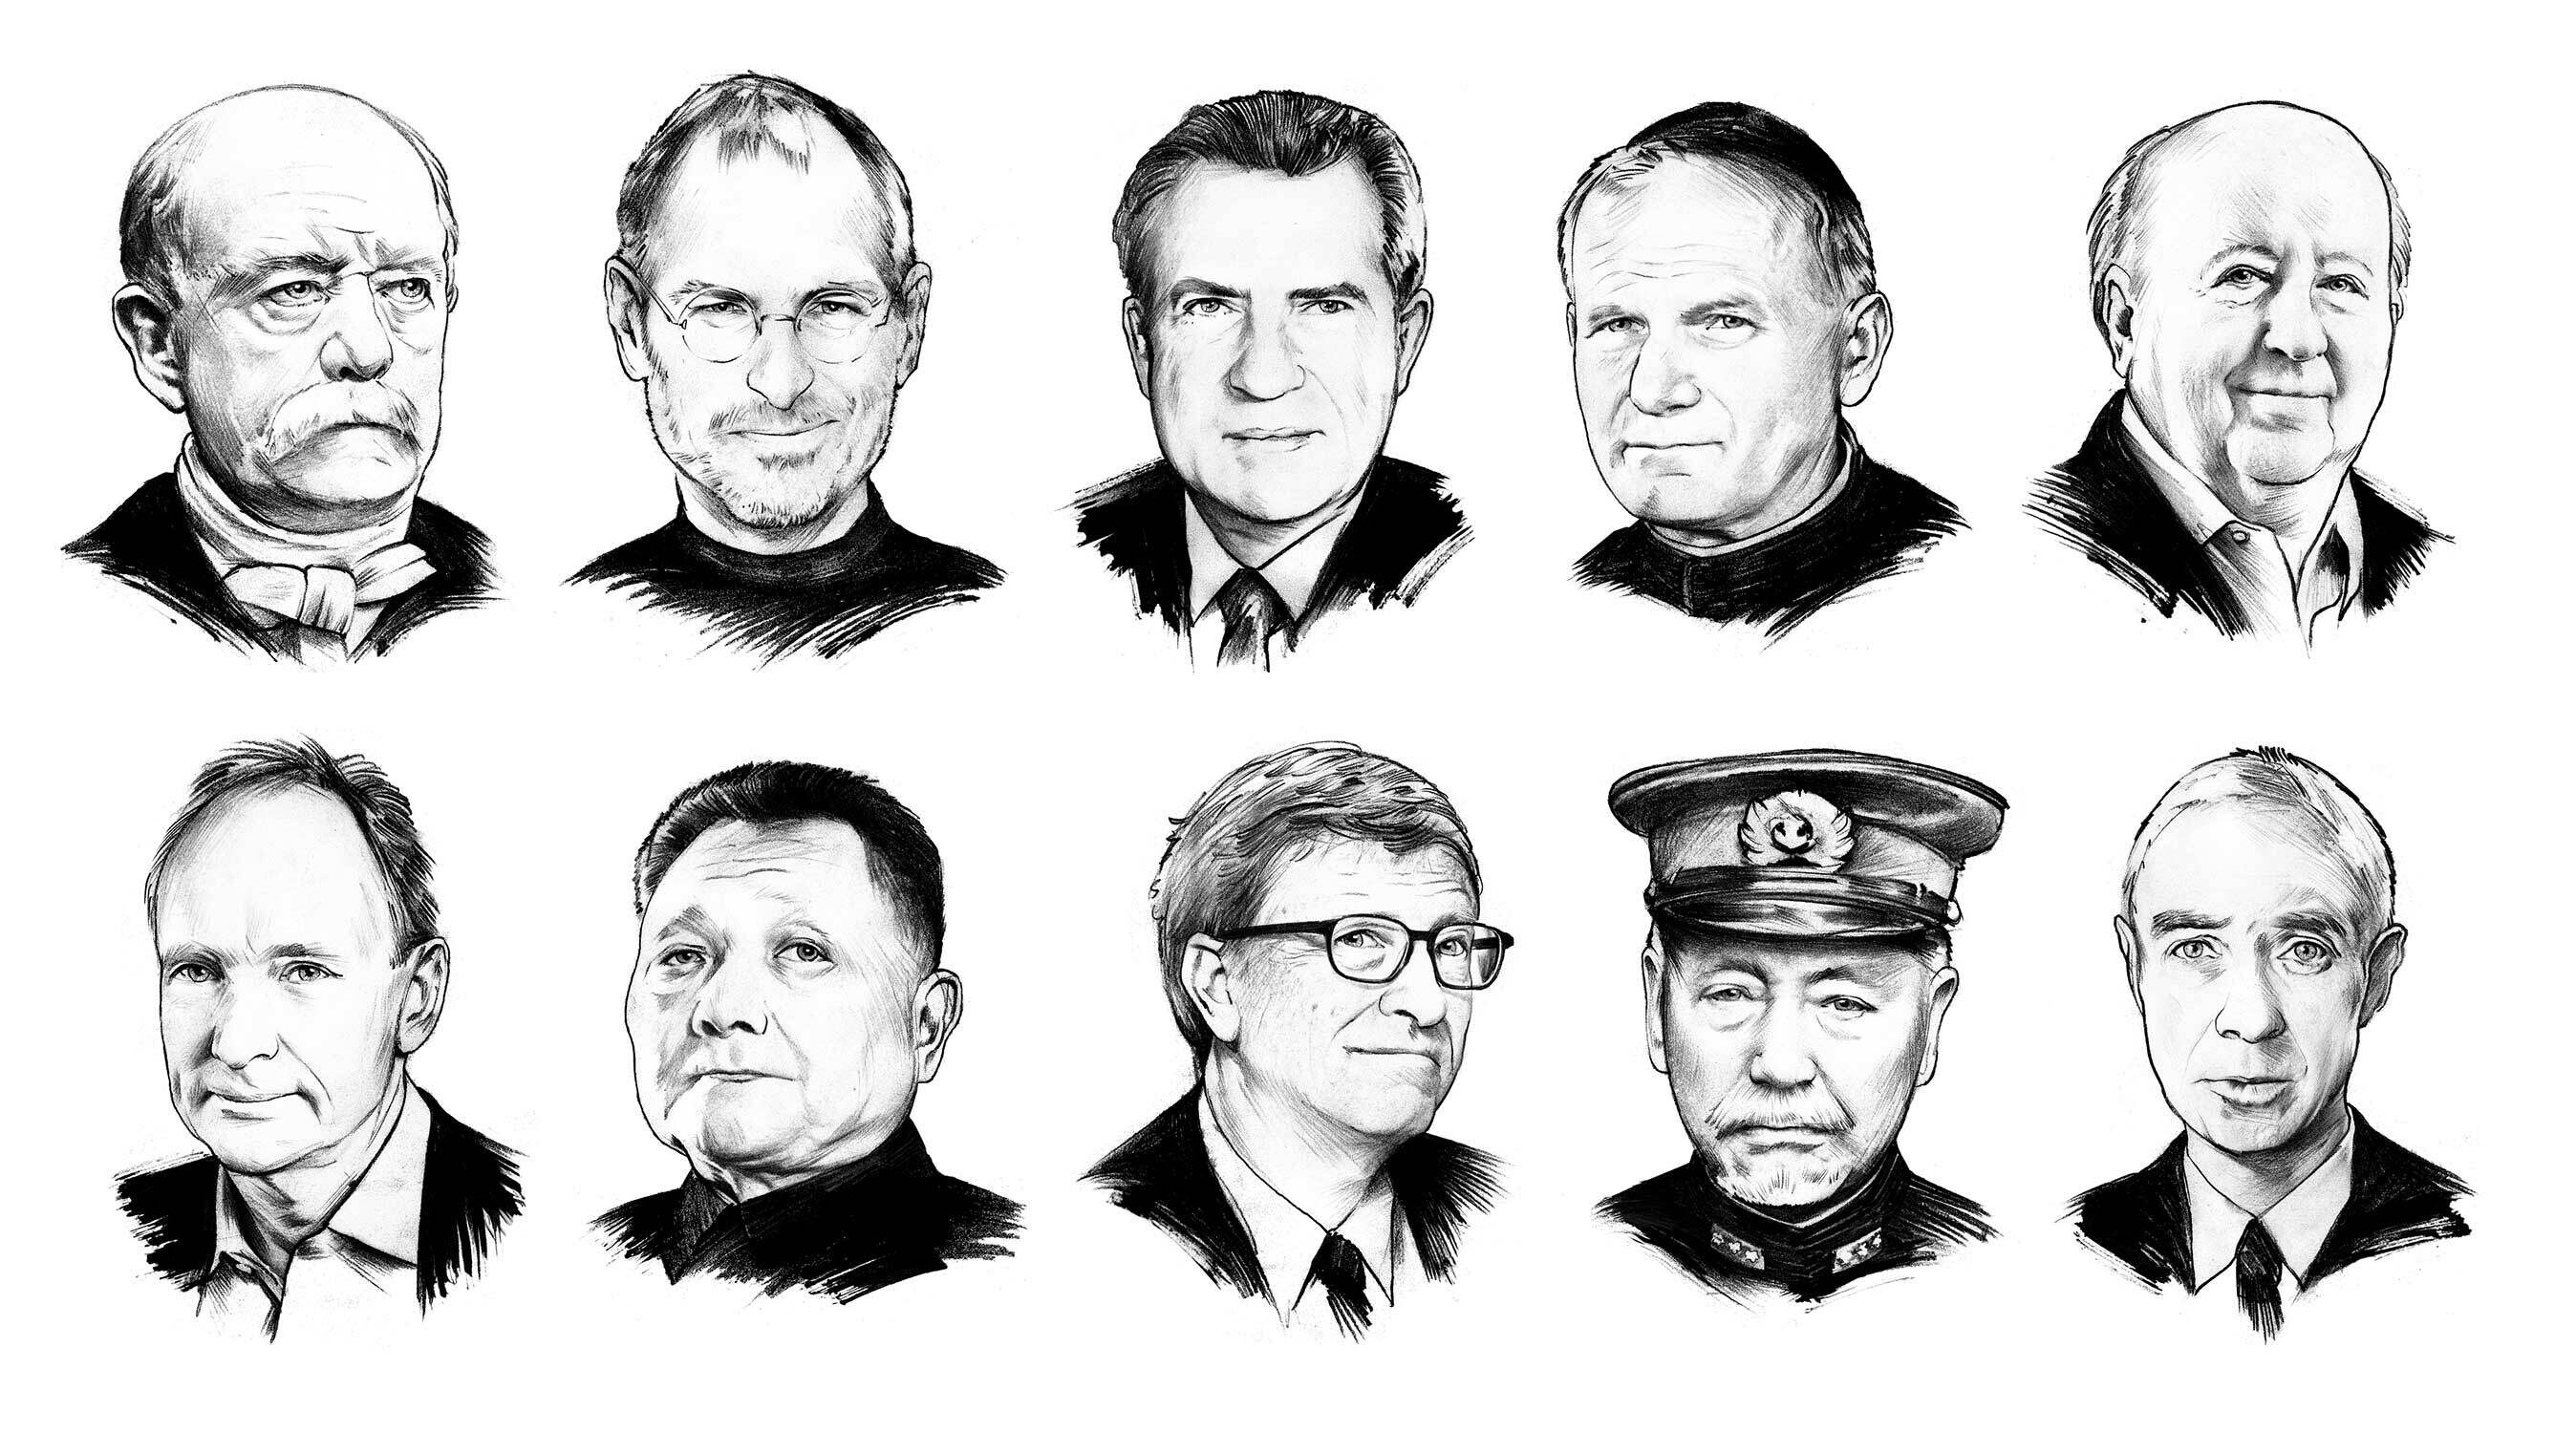 Portrait series illustration jahresbericht black and white editorial - Kornel Illustration | Kornel Stadler portfolio